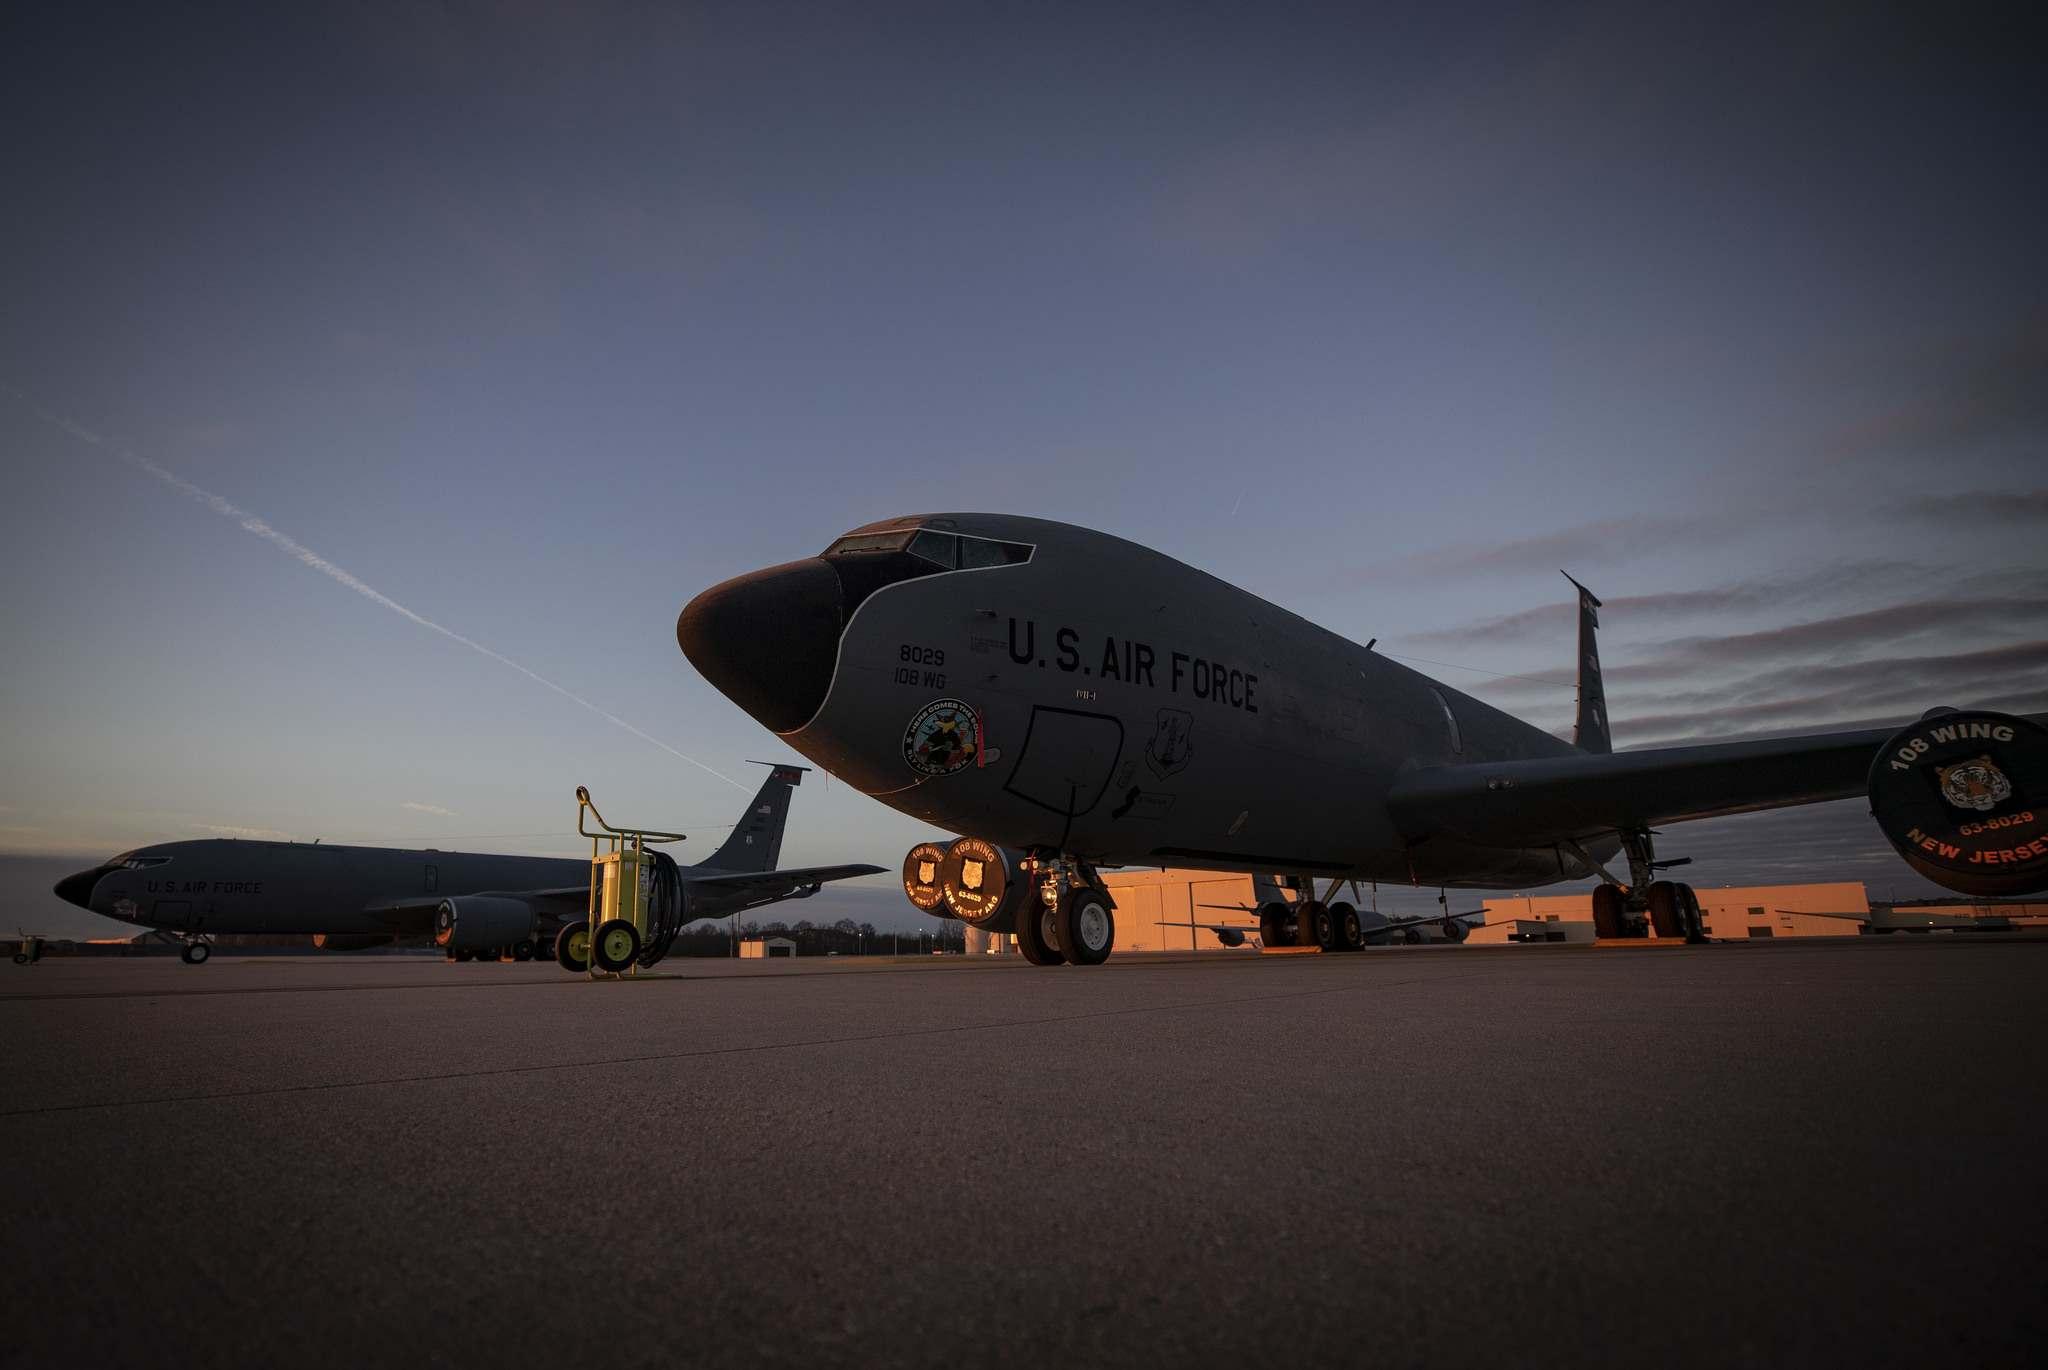 boeing kc 1356 Boeing KC 135R Stratotanker Photos